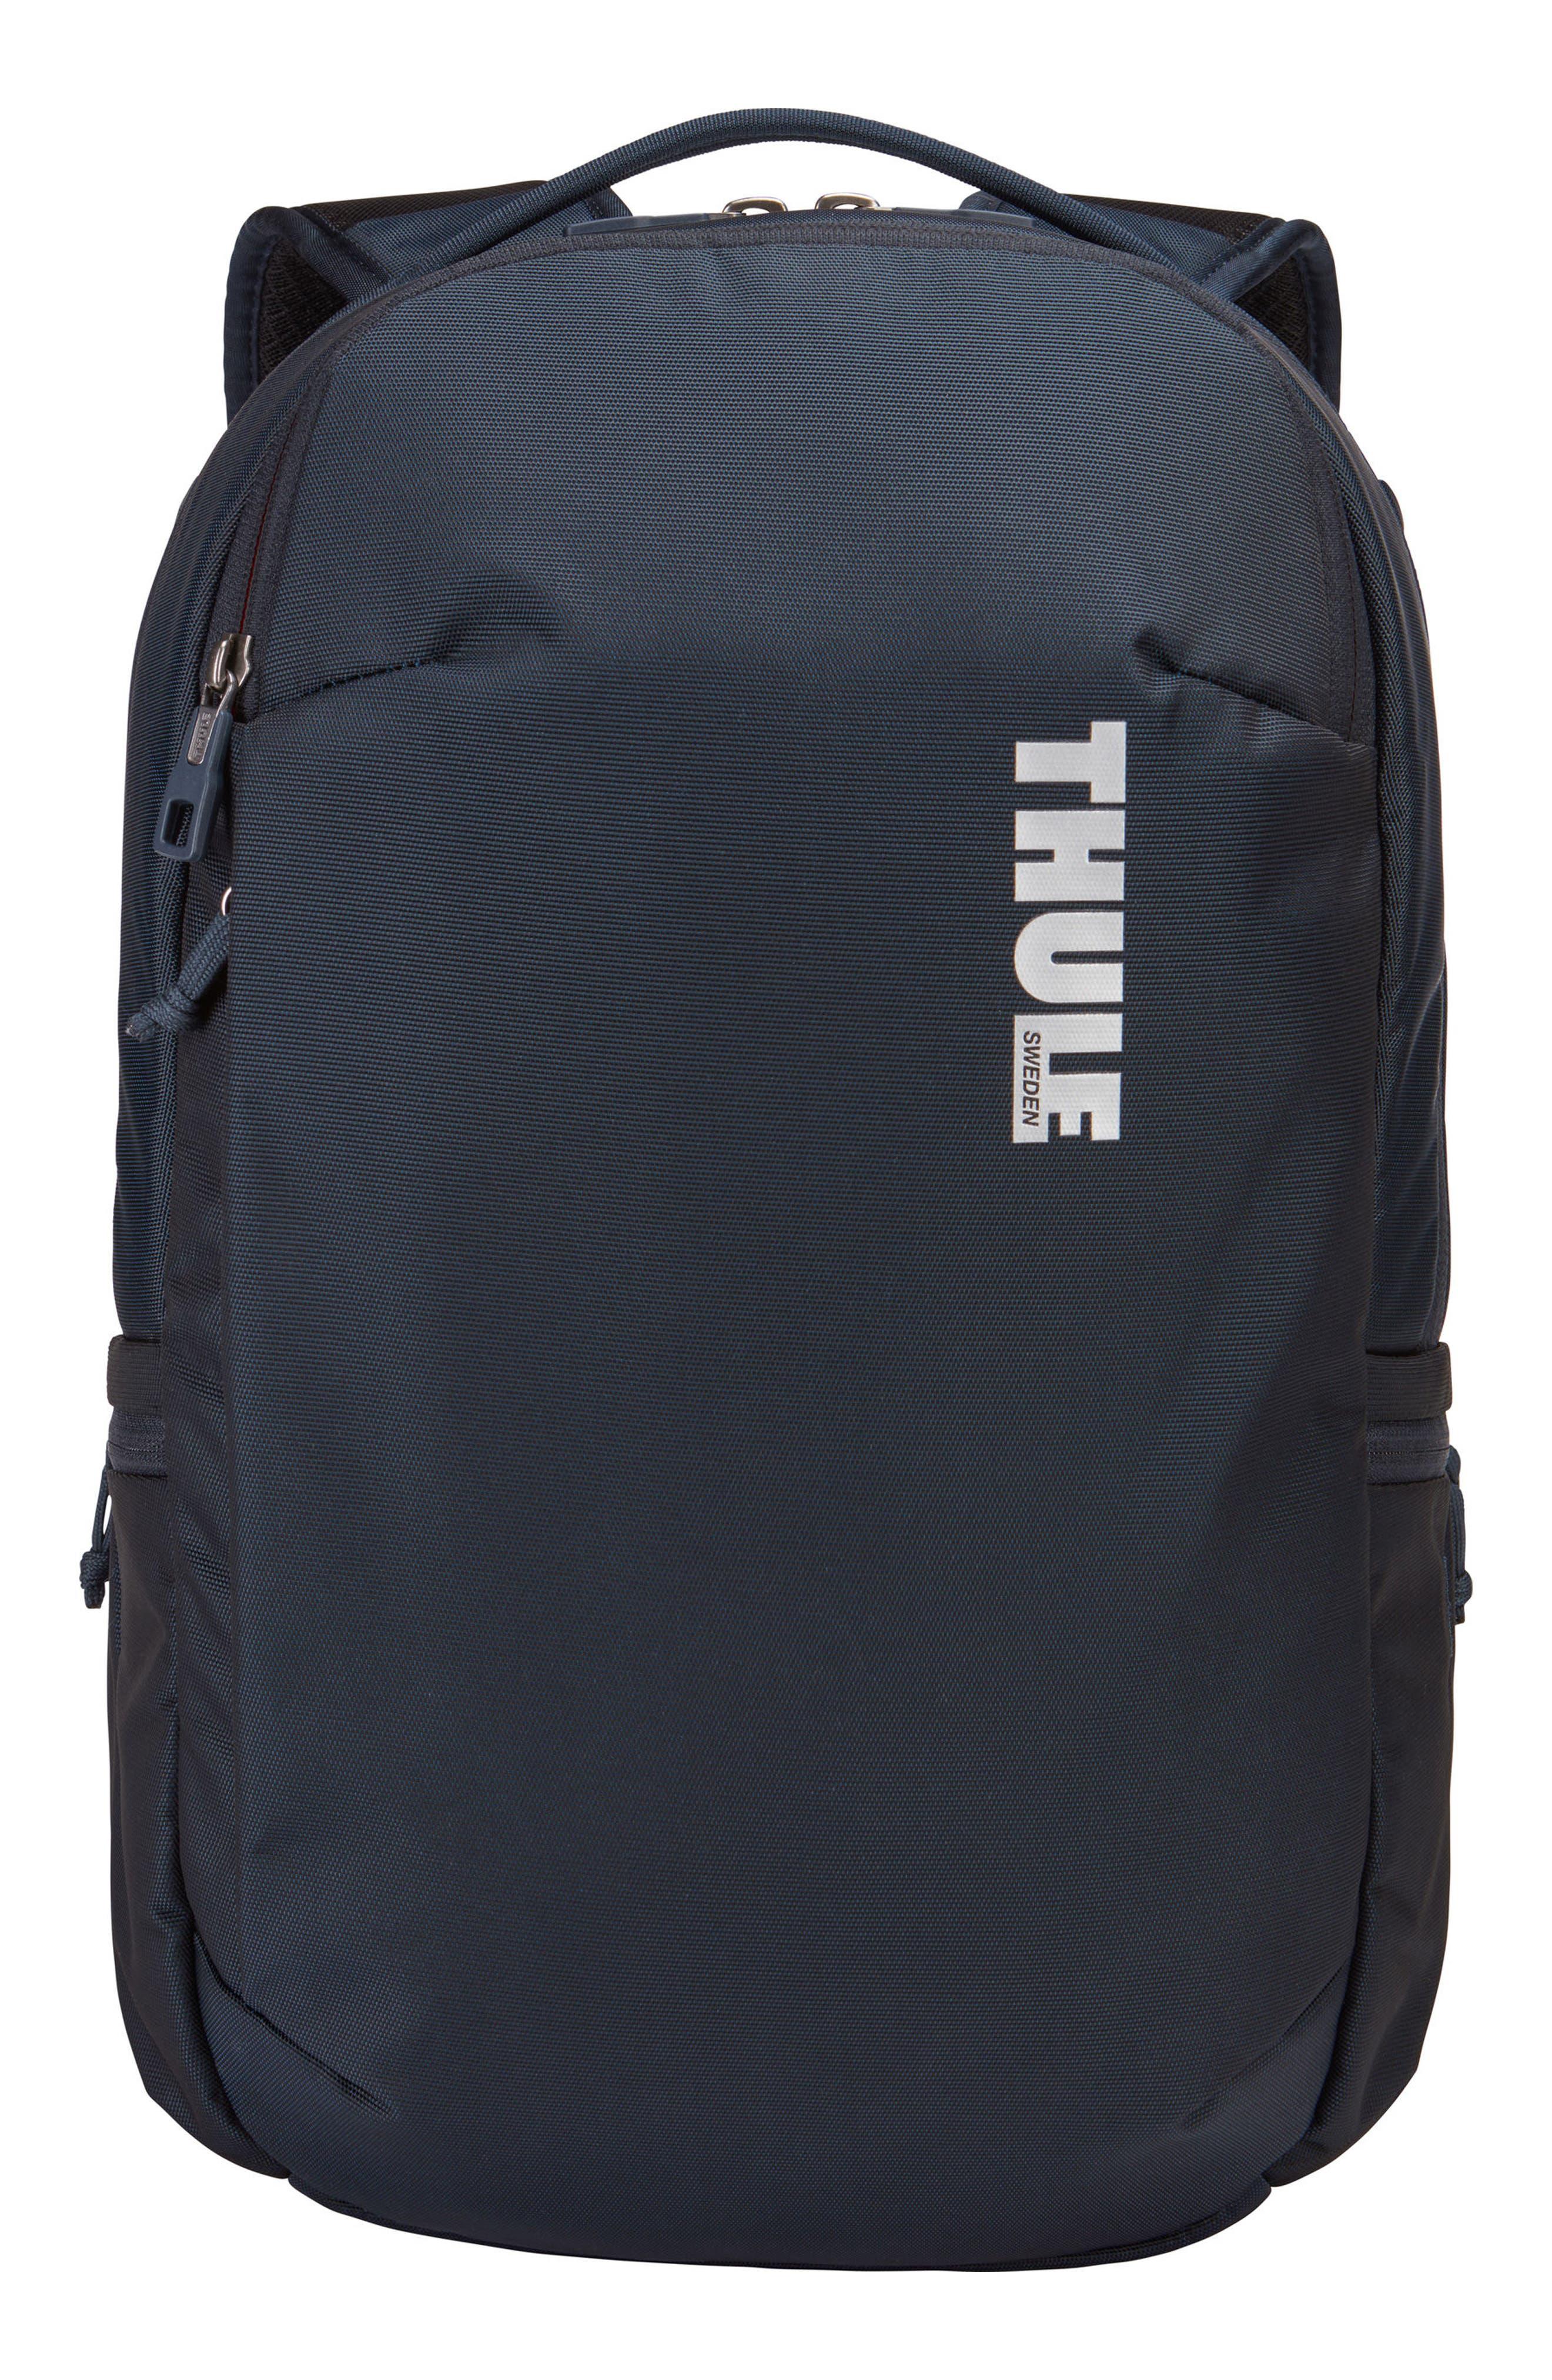 Main Image - Thule Subterra 23-Liter Backpack